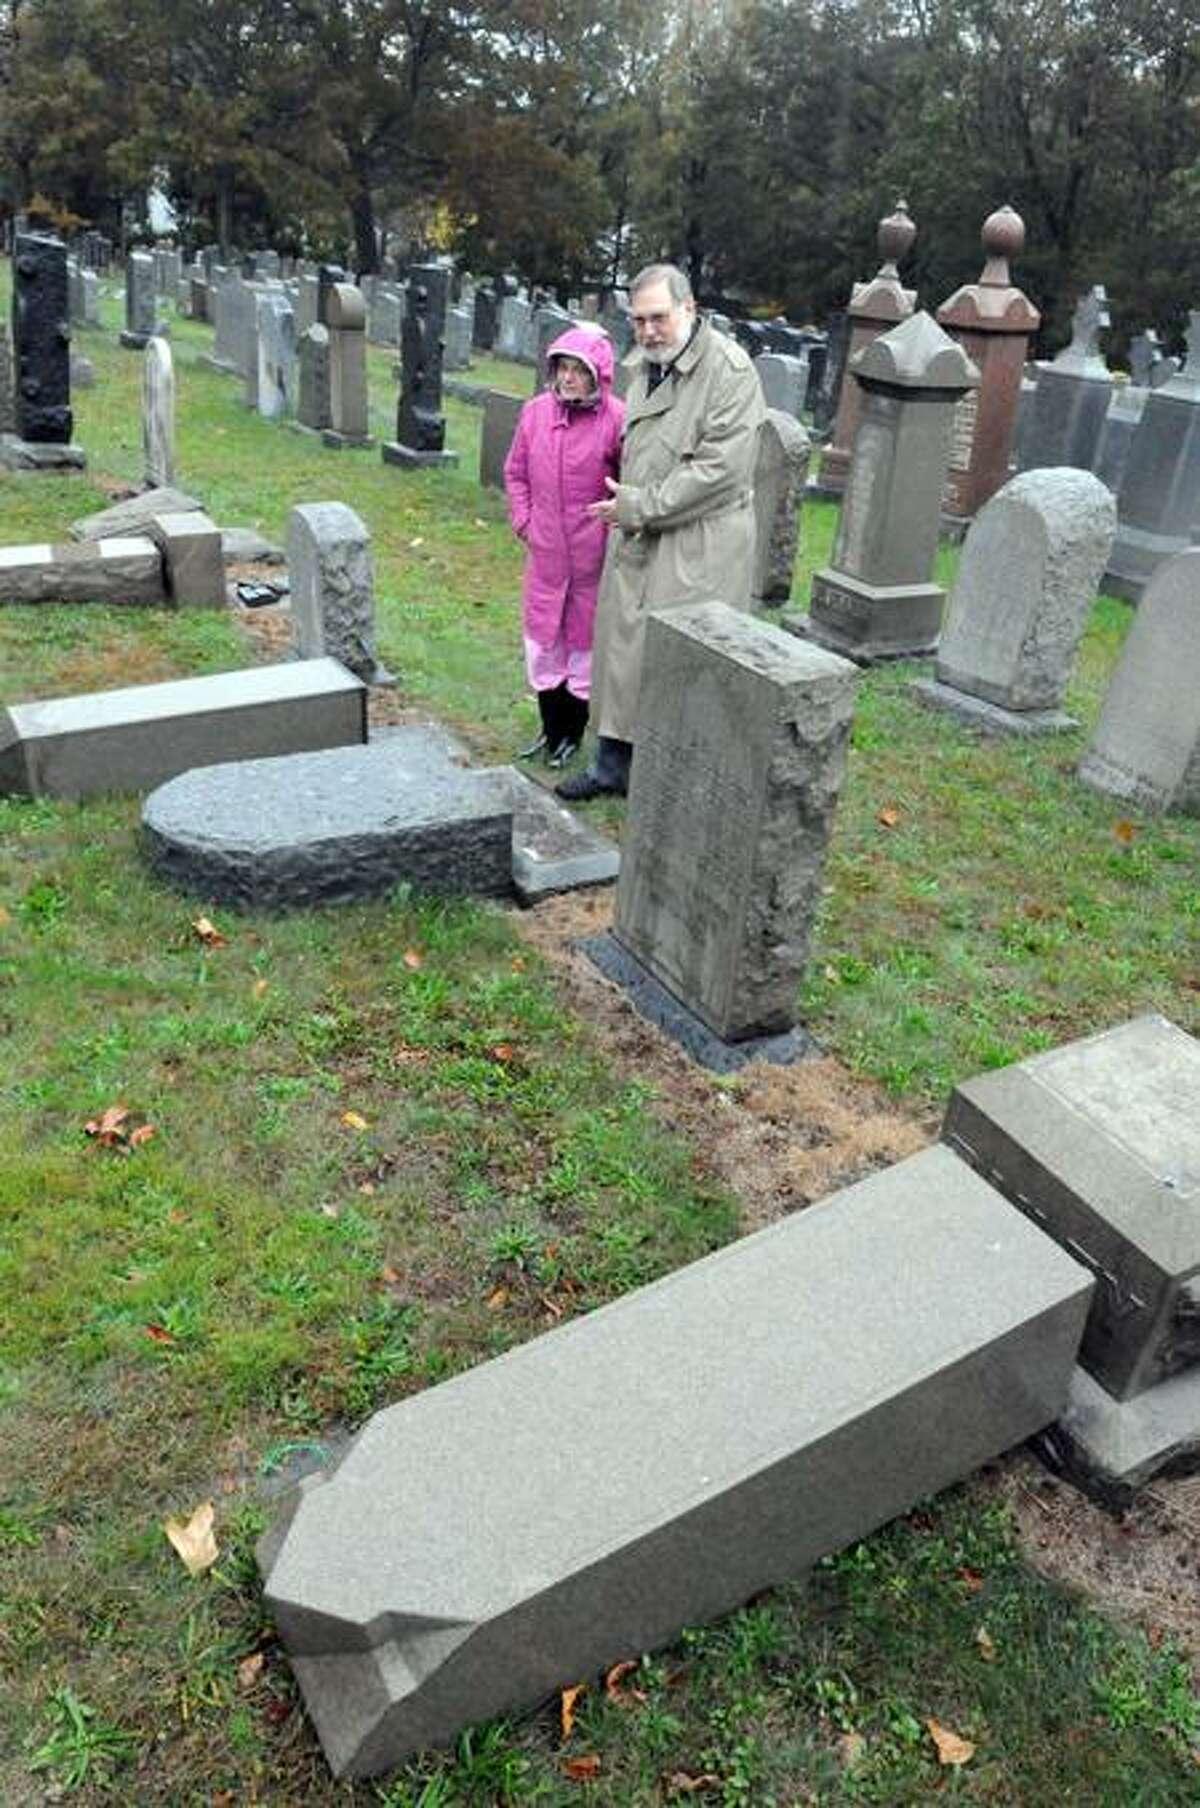 Goldie Goldberg, left, co-chairwoman of the Bikur Cholim Sheveth Achim Cemetery Committee, and congregation President Len Honeyman examine vandalism at the East Haven cemetery Thursday. Peter Hvizdak/Register